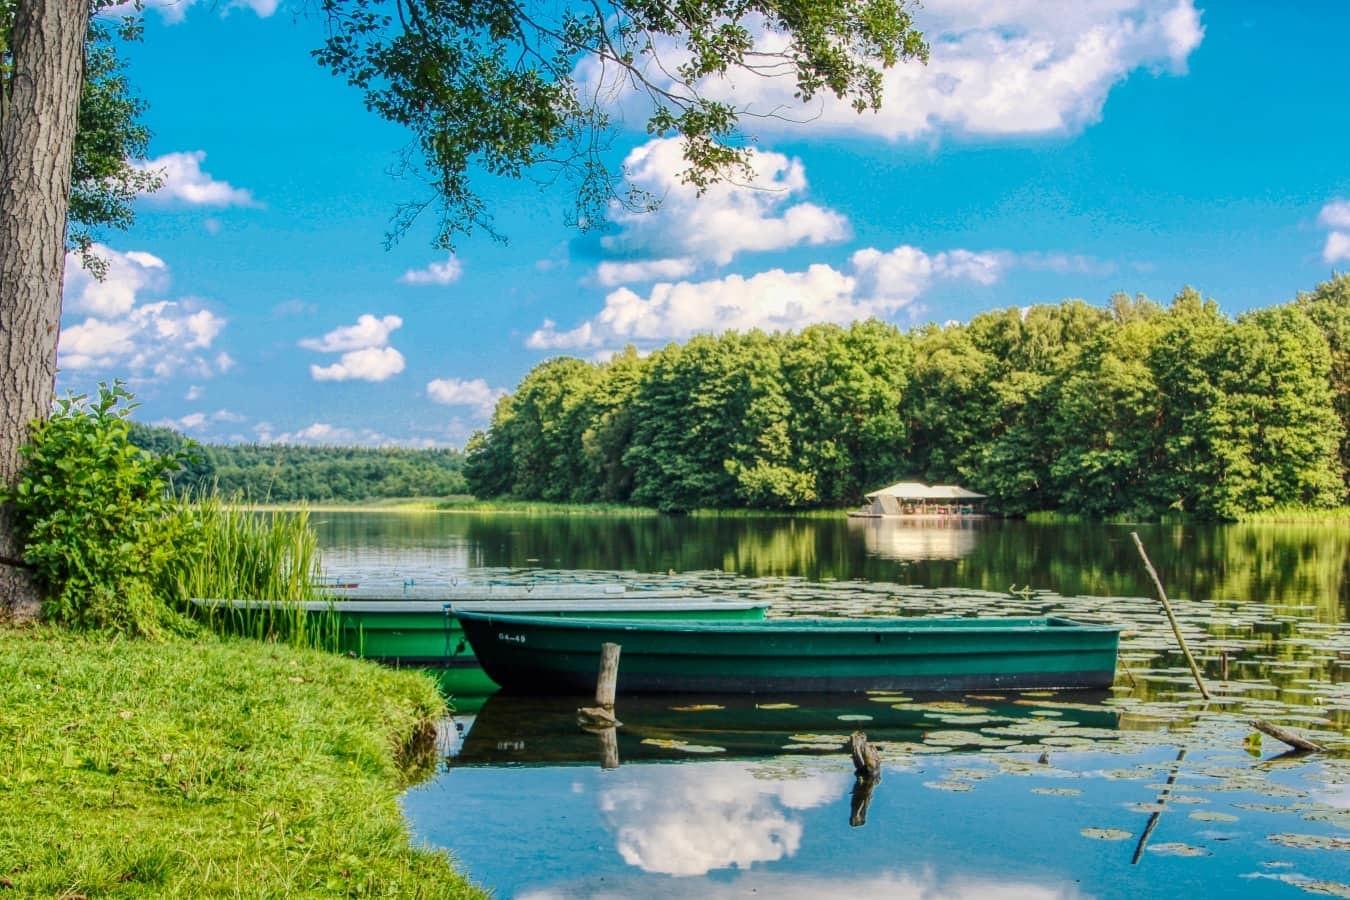 floss-ruderboot-oberpfulsee-brandenburg-lychen